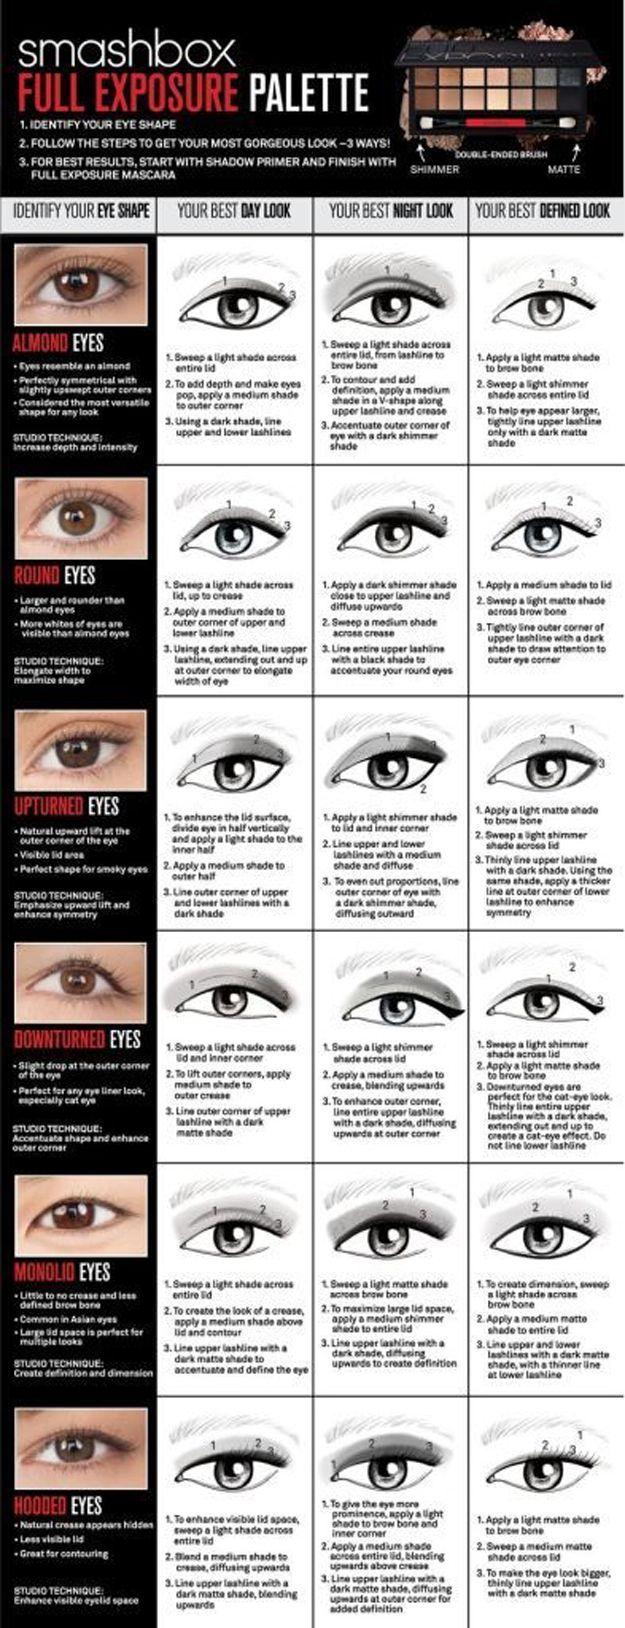 Eye Makeup Tips | Best Eyeliner and Eyeshadow Tips by Makeup Tutorials at makeup...